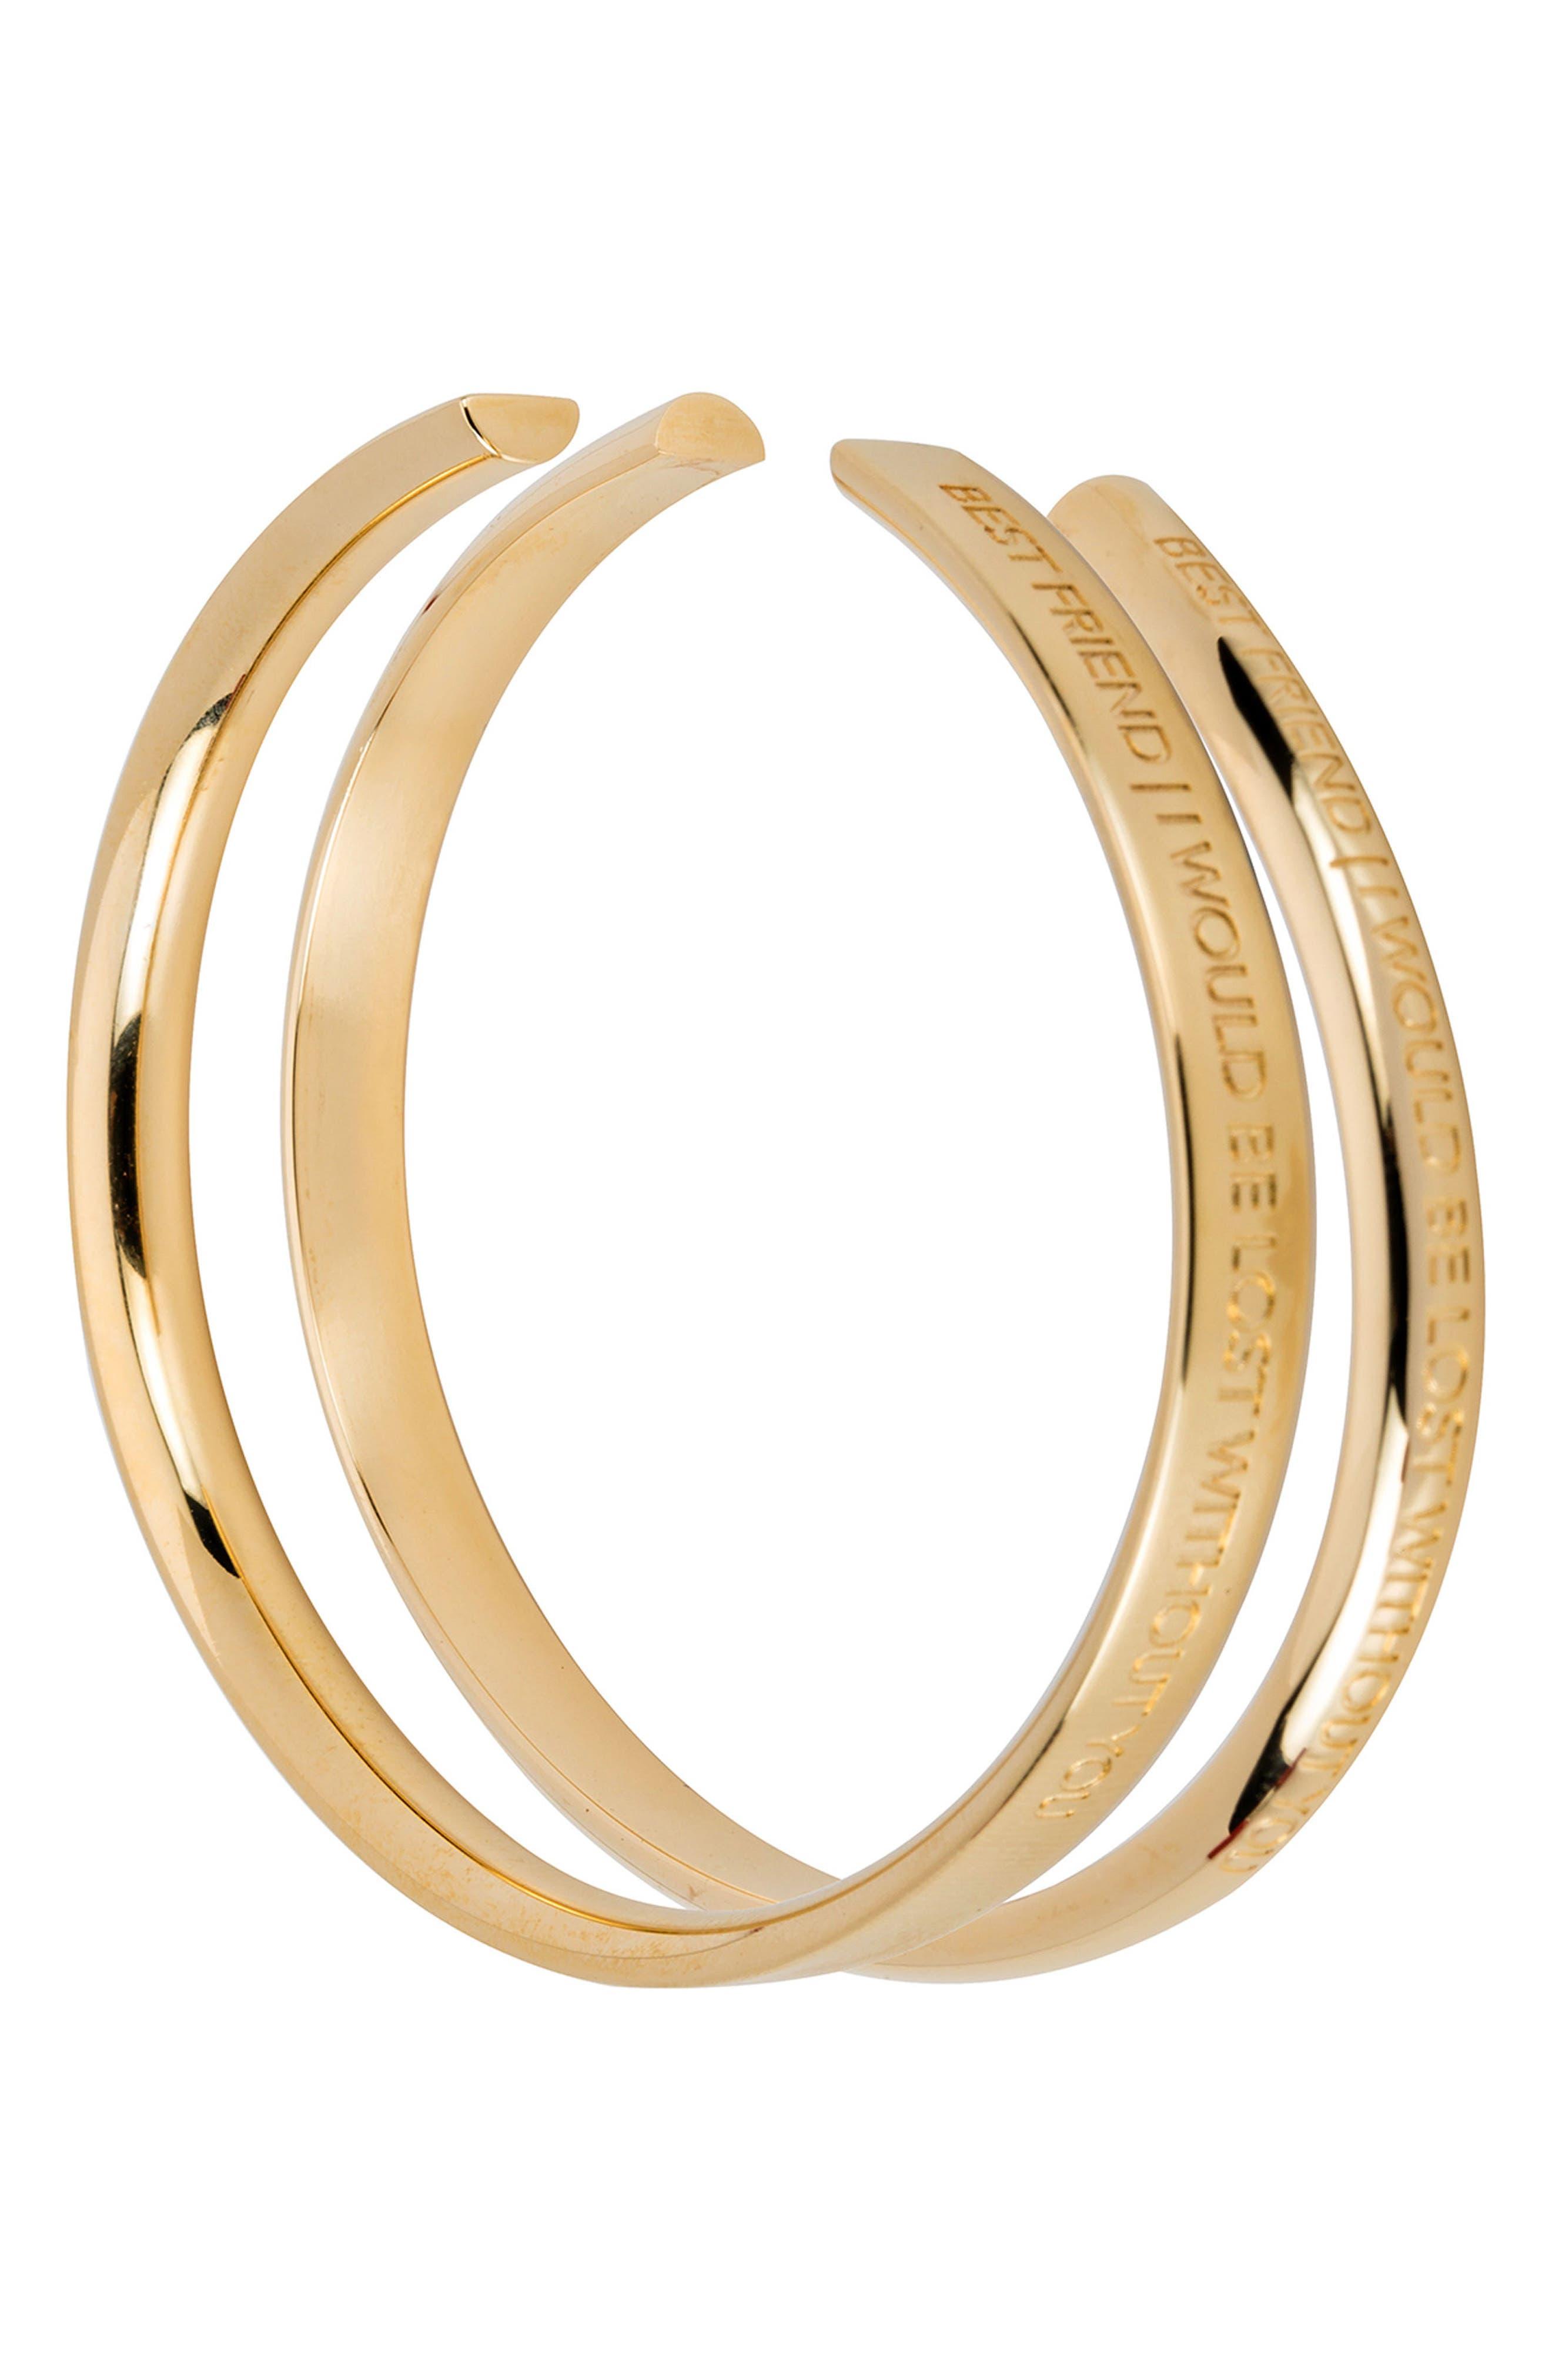 Best Friends Set of 2 Wrist Cuffs,                         Main,                         color, Gold